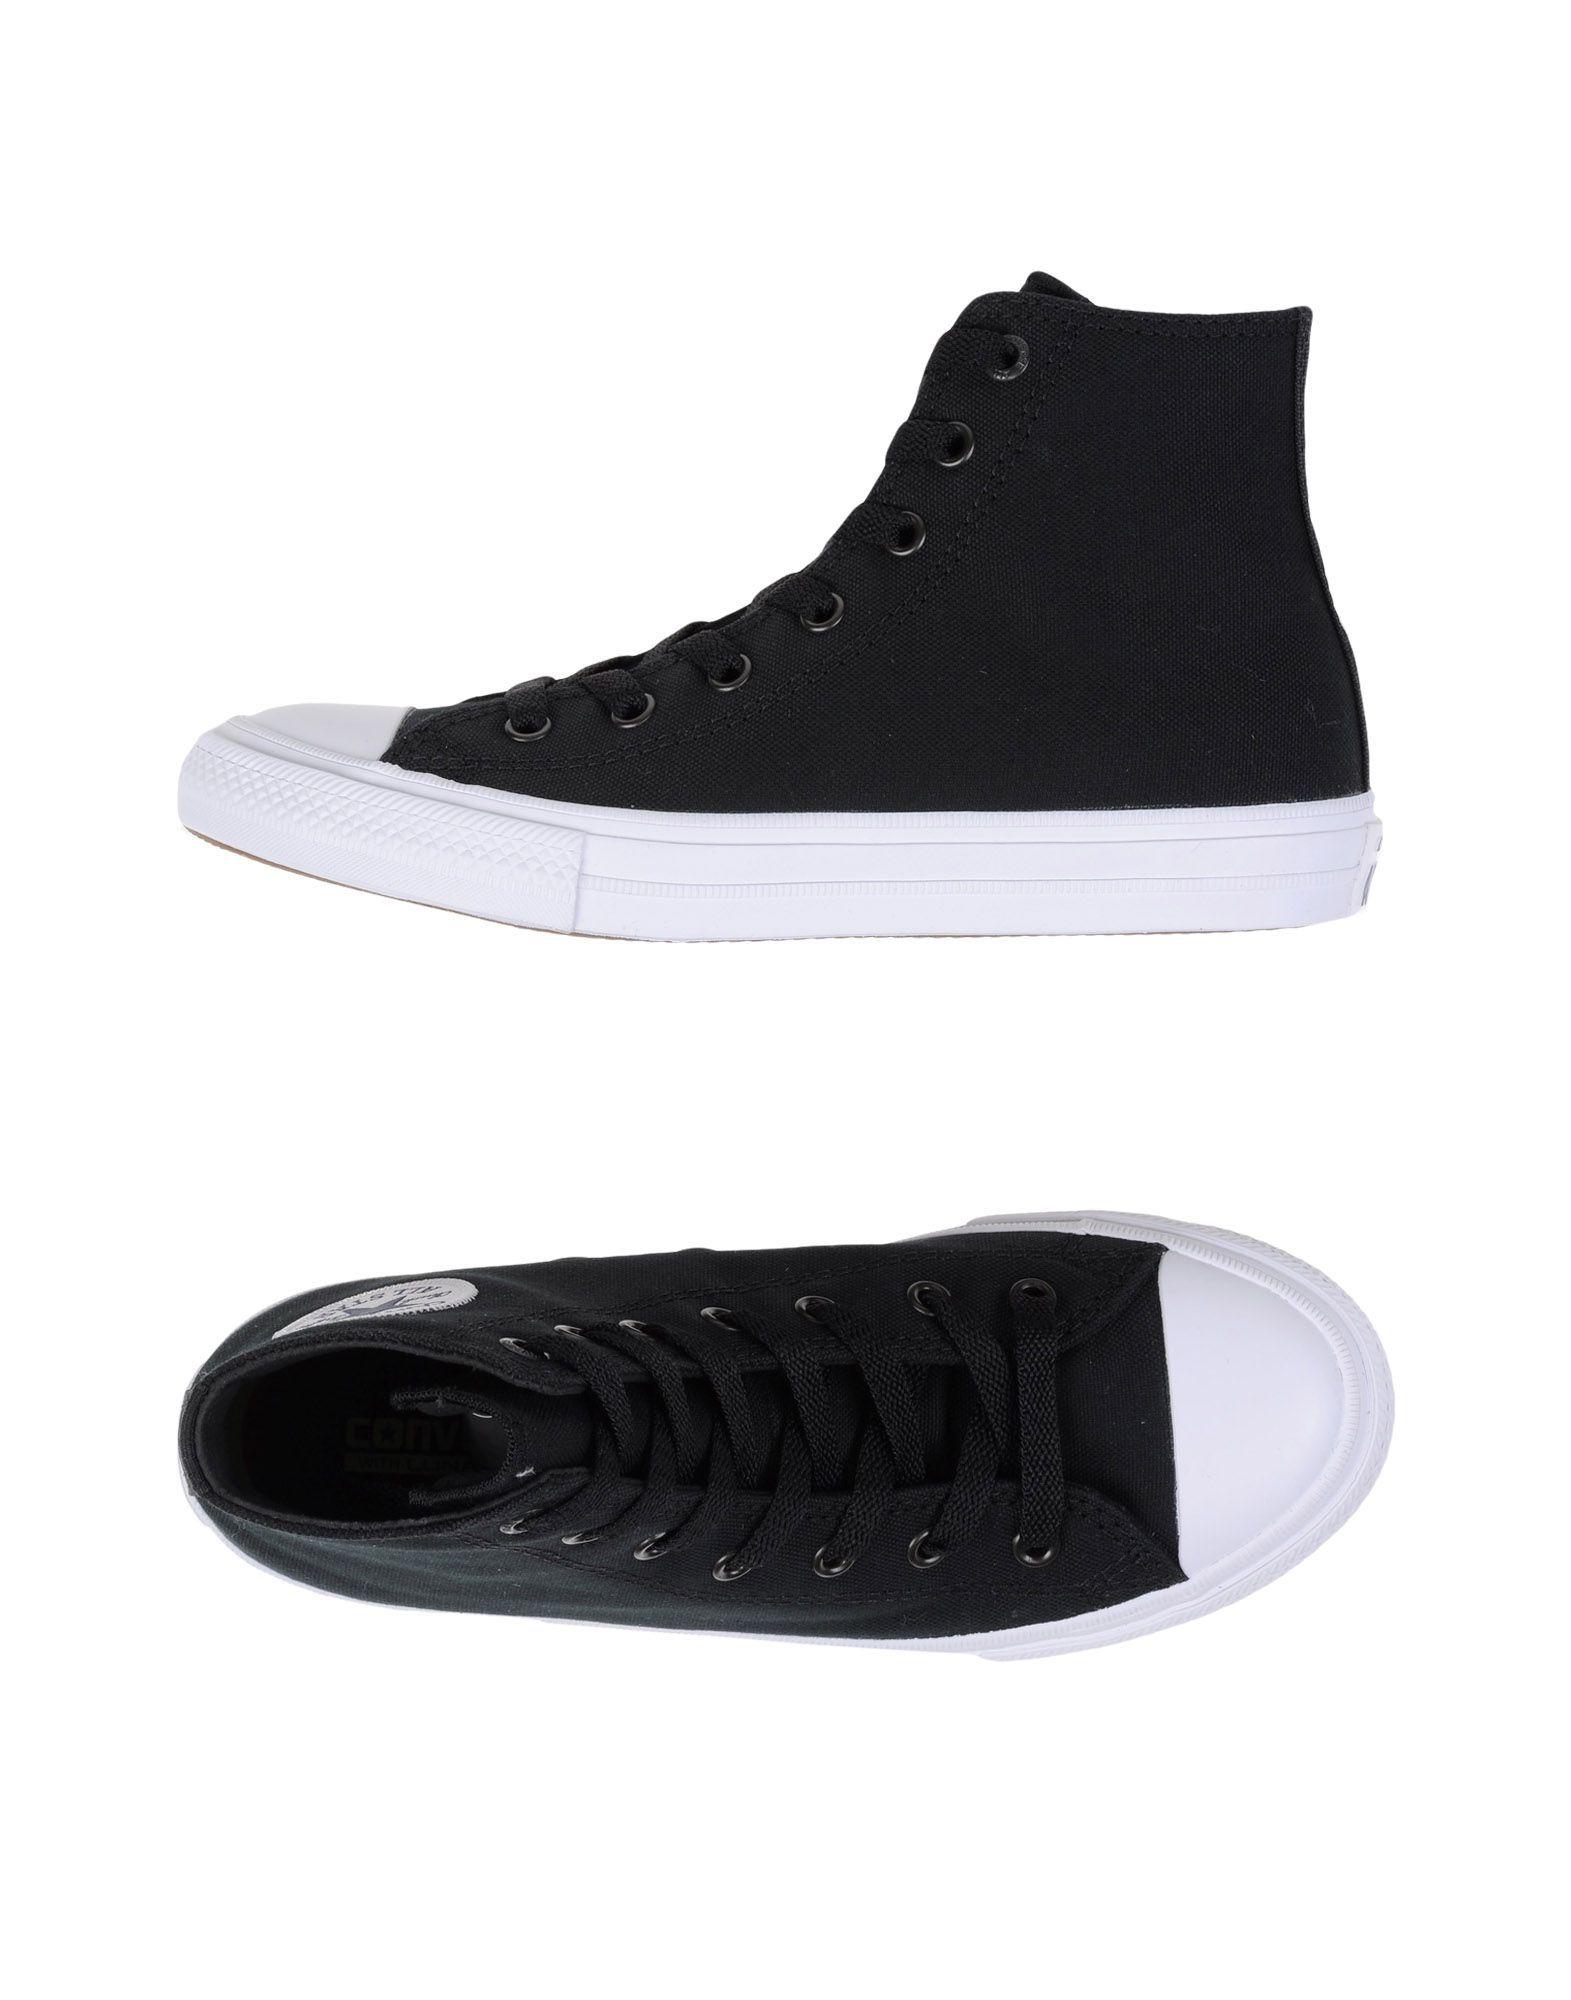 Converse All Star Black High-tops